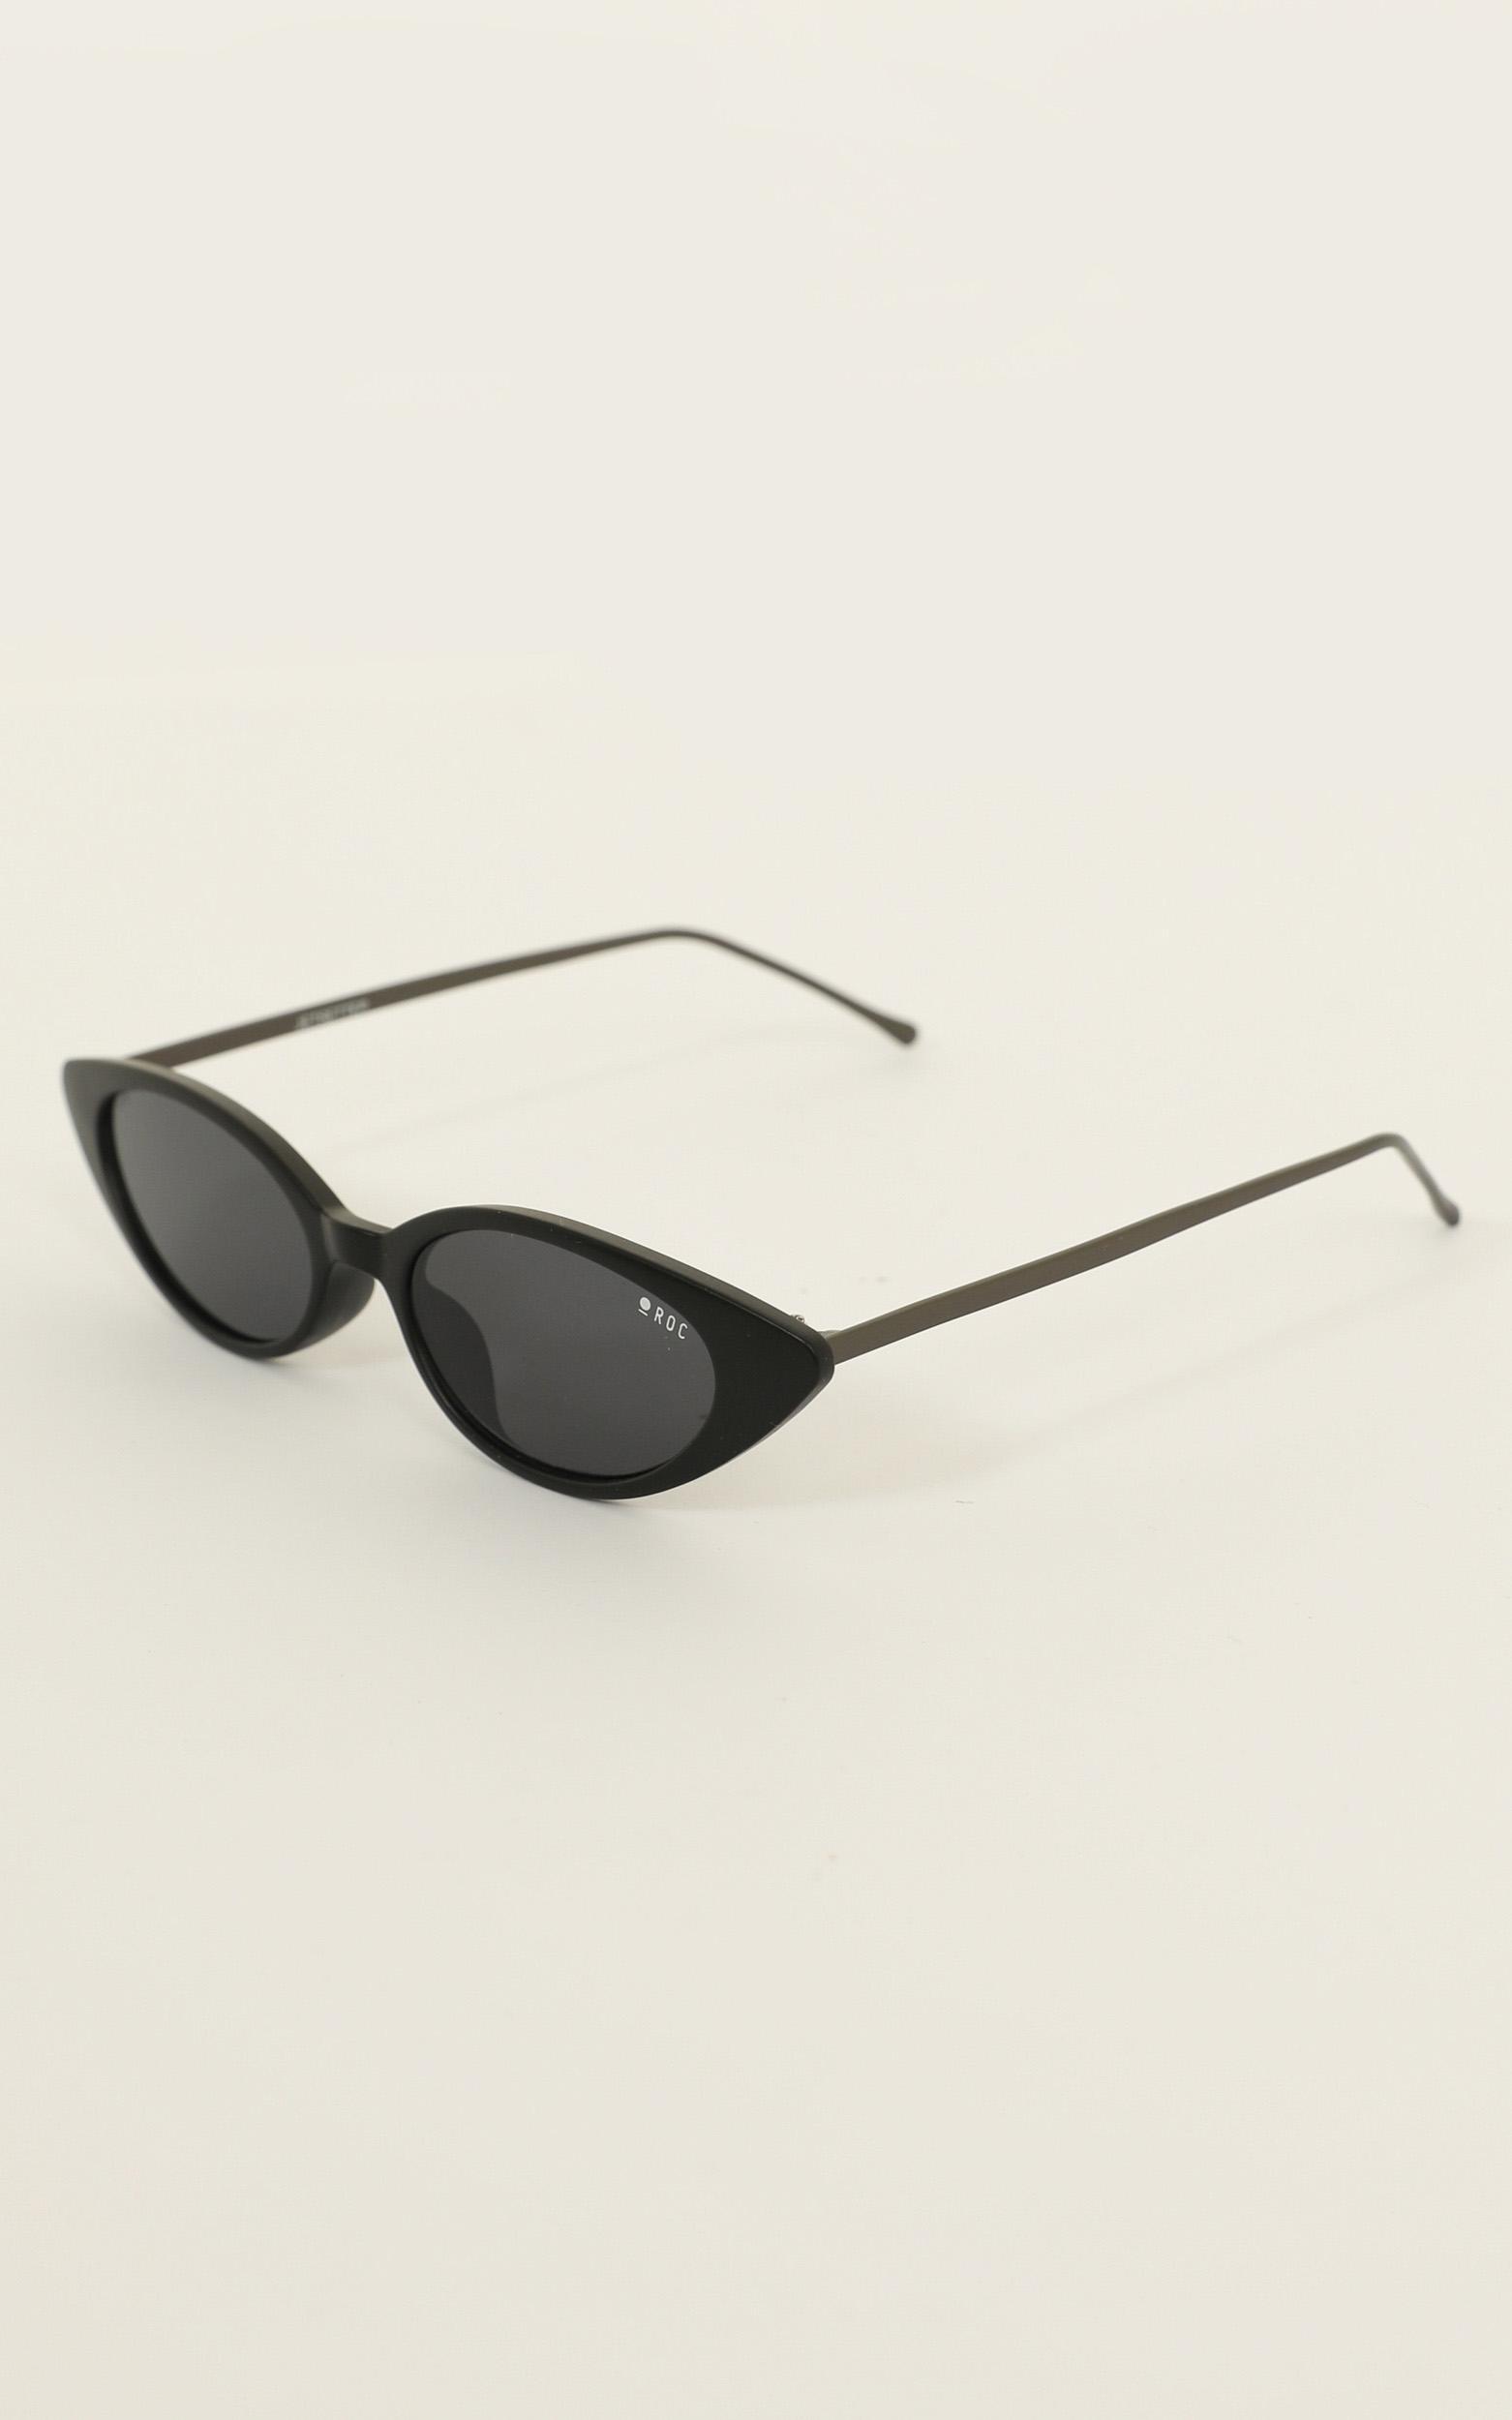 Roc - Jetsetter Sunglasses In Matte Black, , hi-res image number null